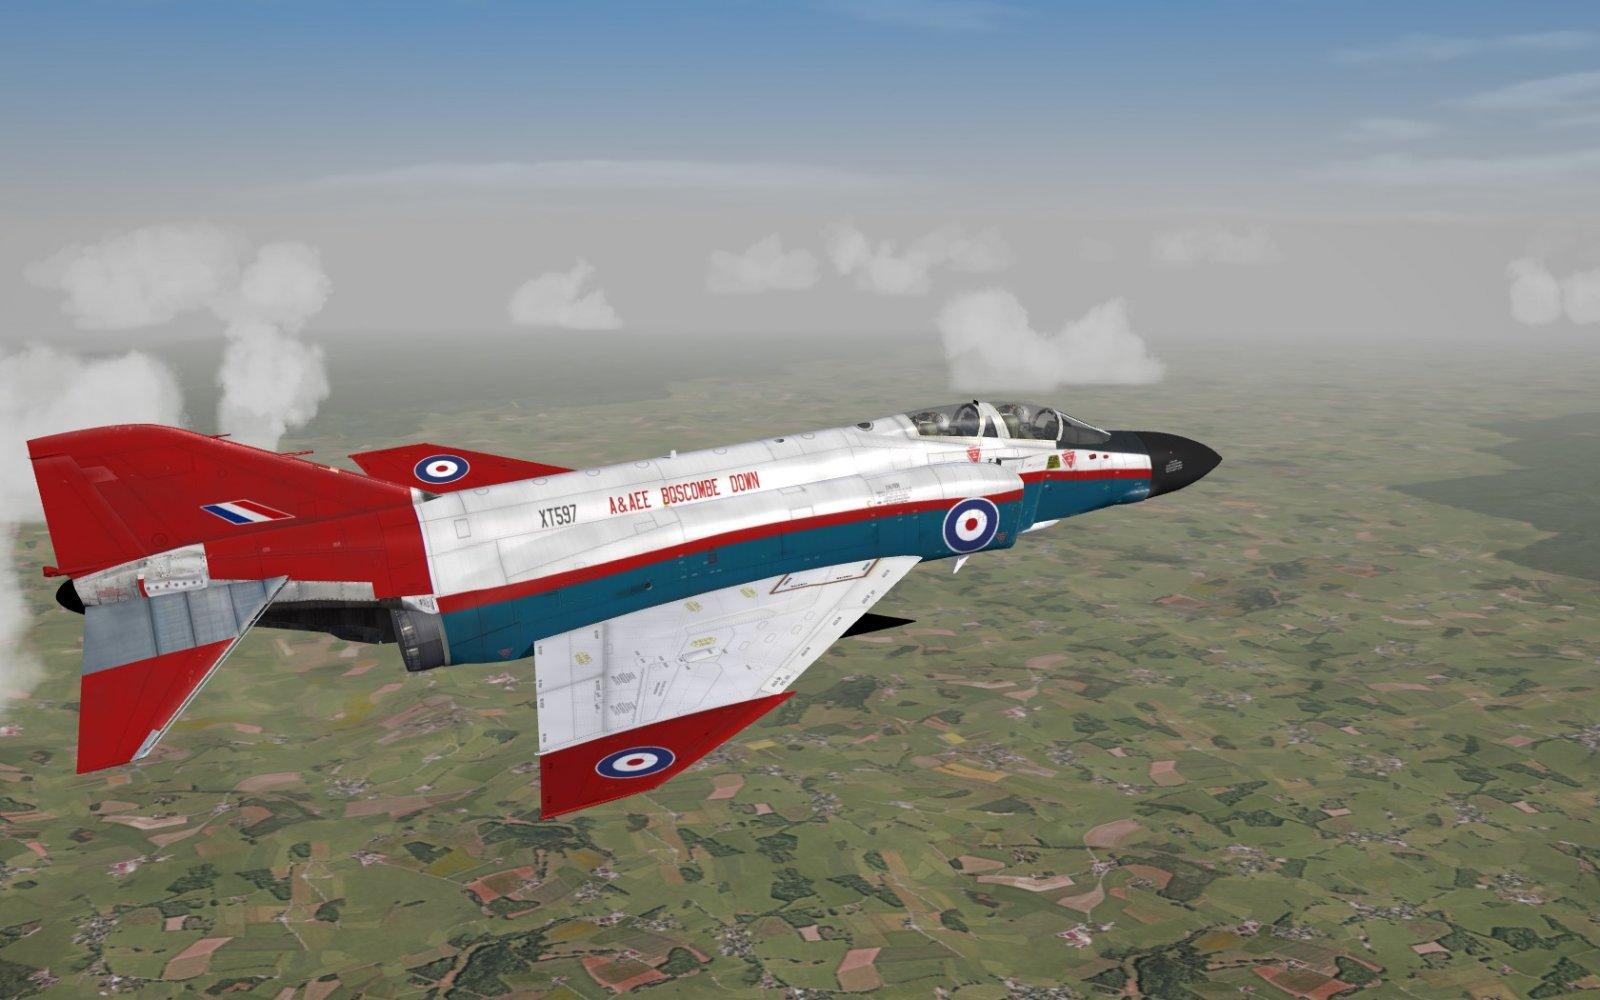 Phantom FG1, XT597 of A (Fast Jet Test) Squadron, A&AEE Boscombe Down, Wiltshire